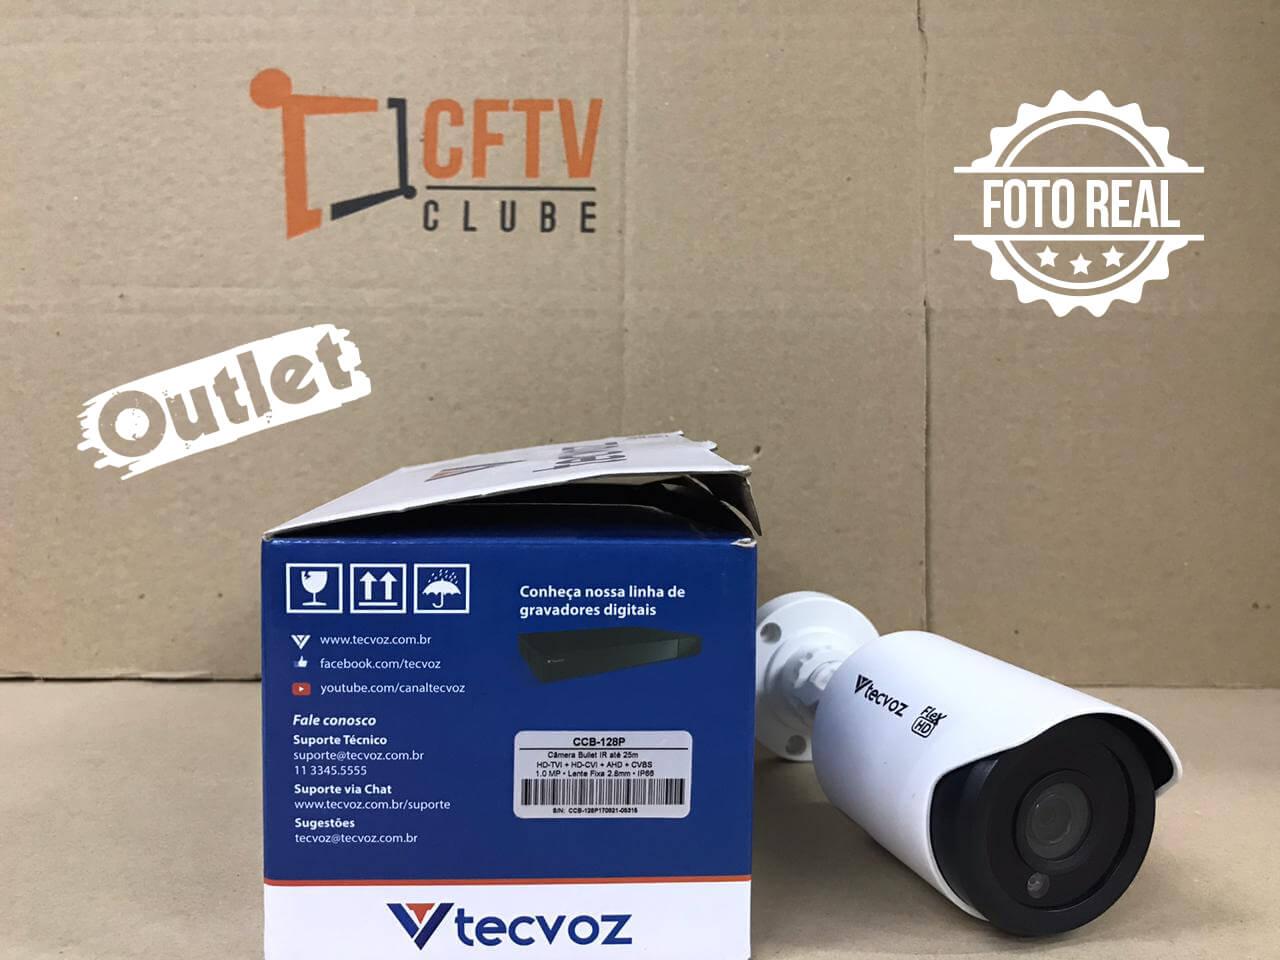 Outlet - Câmera Tecvoz Bullet Flex HD CCB-128P Alta Definição (1.0MP | 720p | 2.8mm | Plast)  - CFTV Clube | Brasil